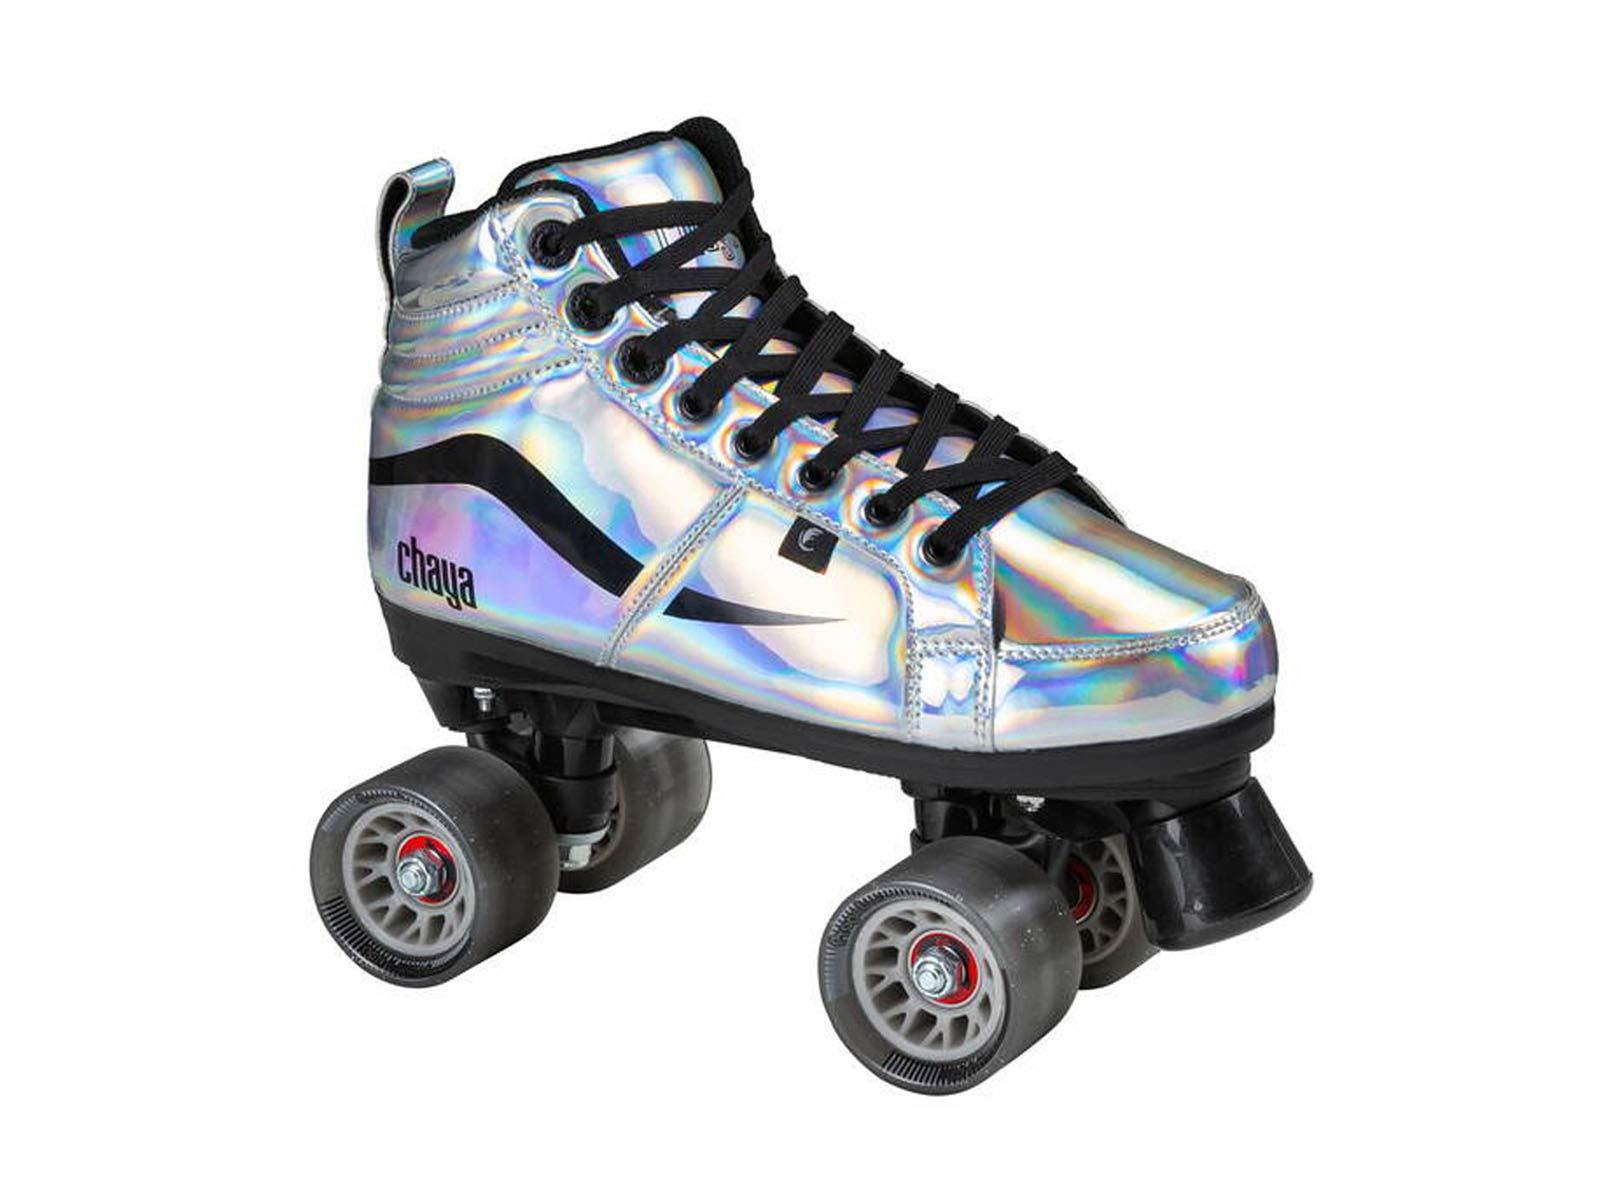 Chaya New Vintage Glide Chrome Quad Roller Skates - Vegan (Euro 39 / US 8)